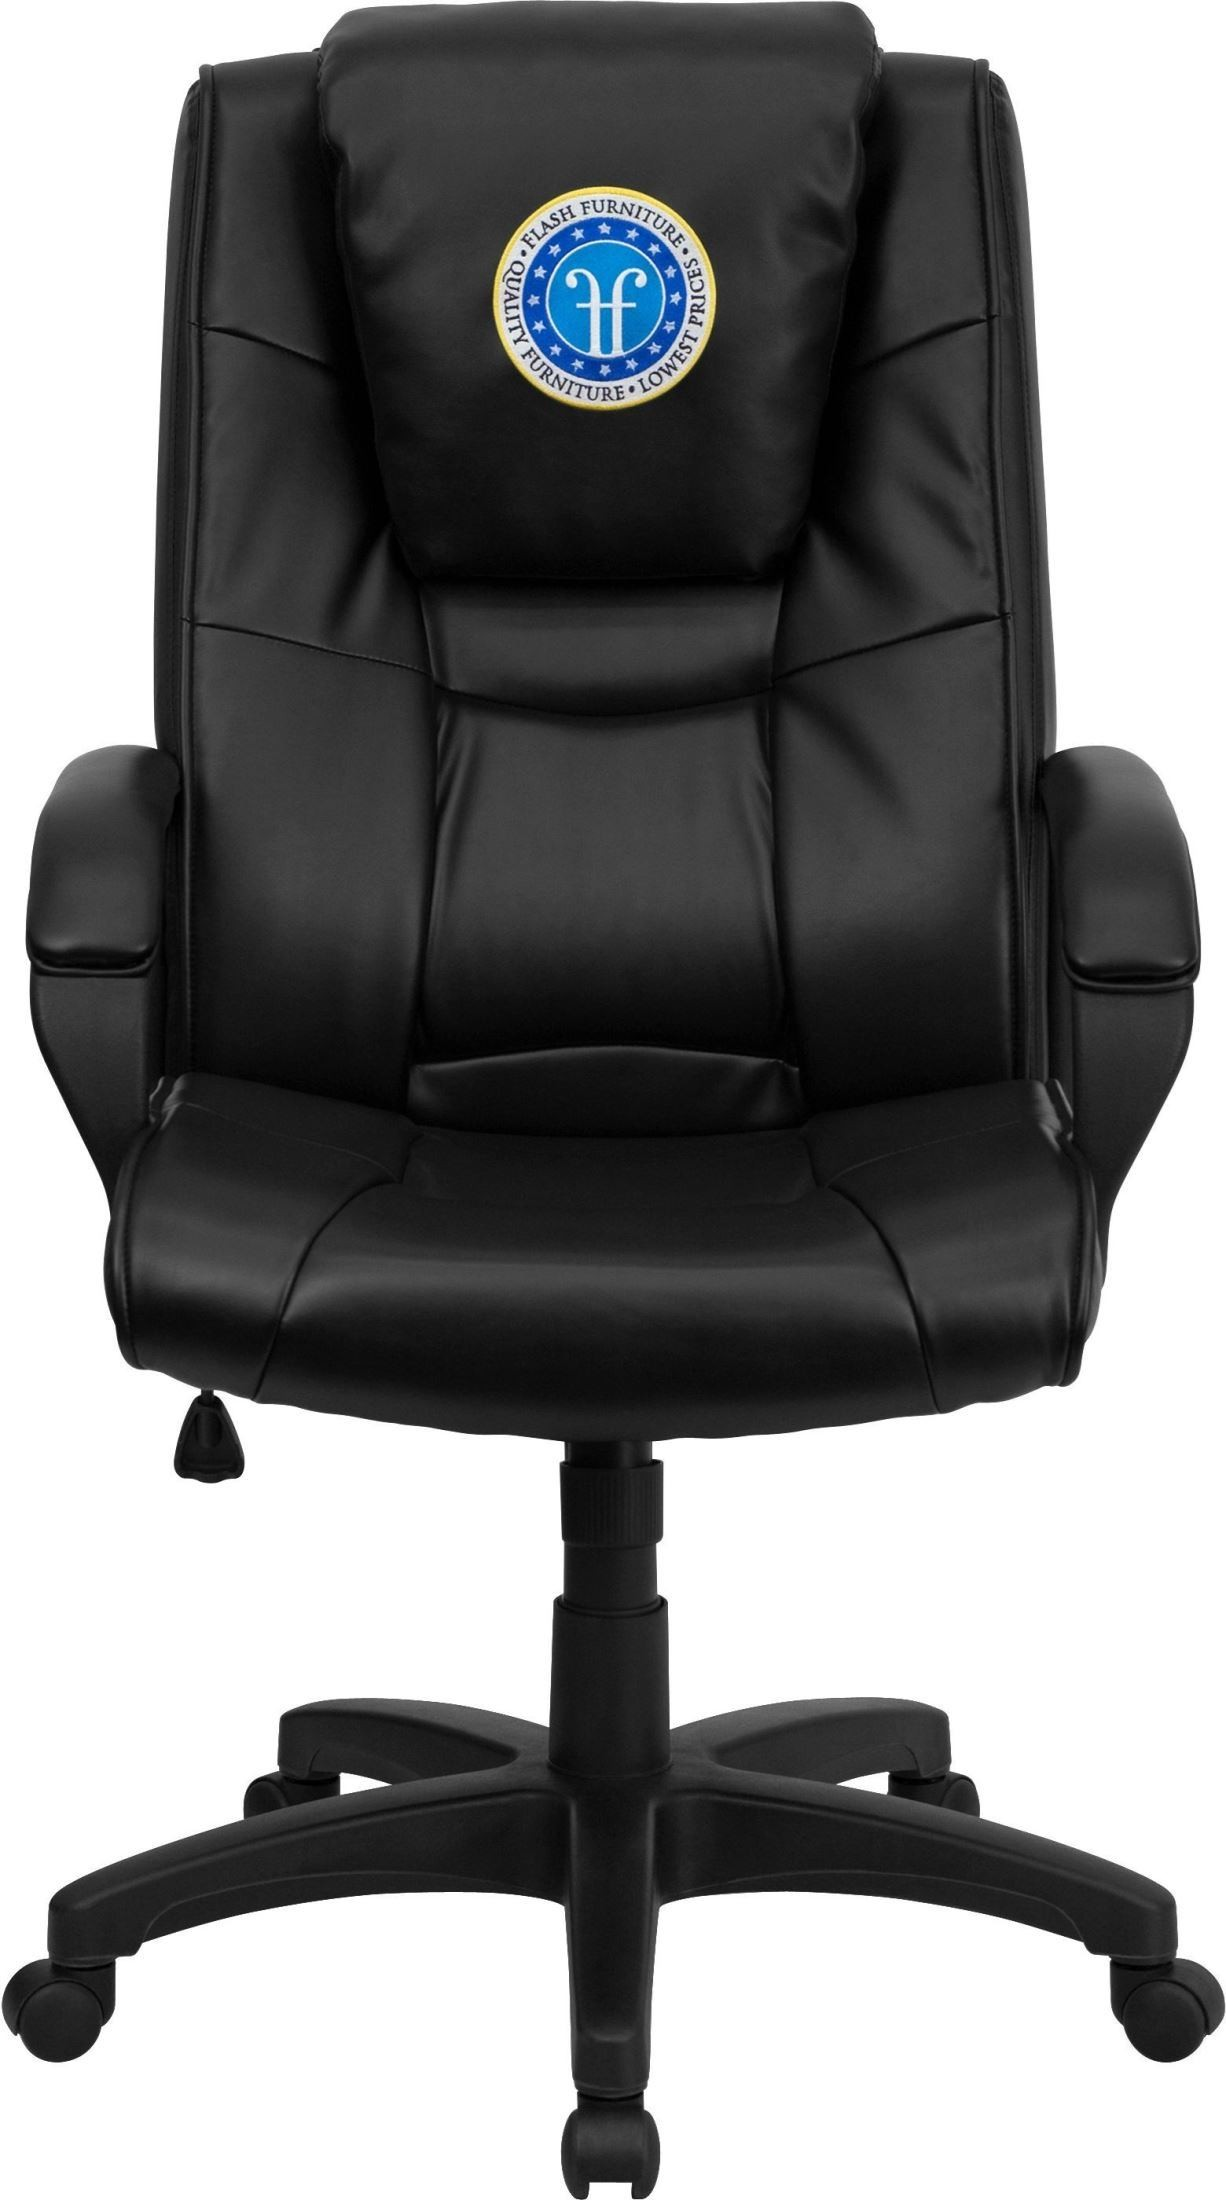 coleman lumbar quattro chair outdoor canvas covers nz 31117 high back design black executive swivel office